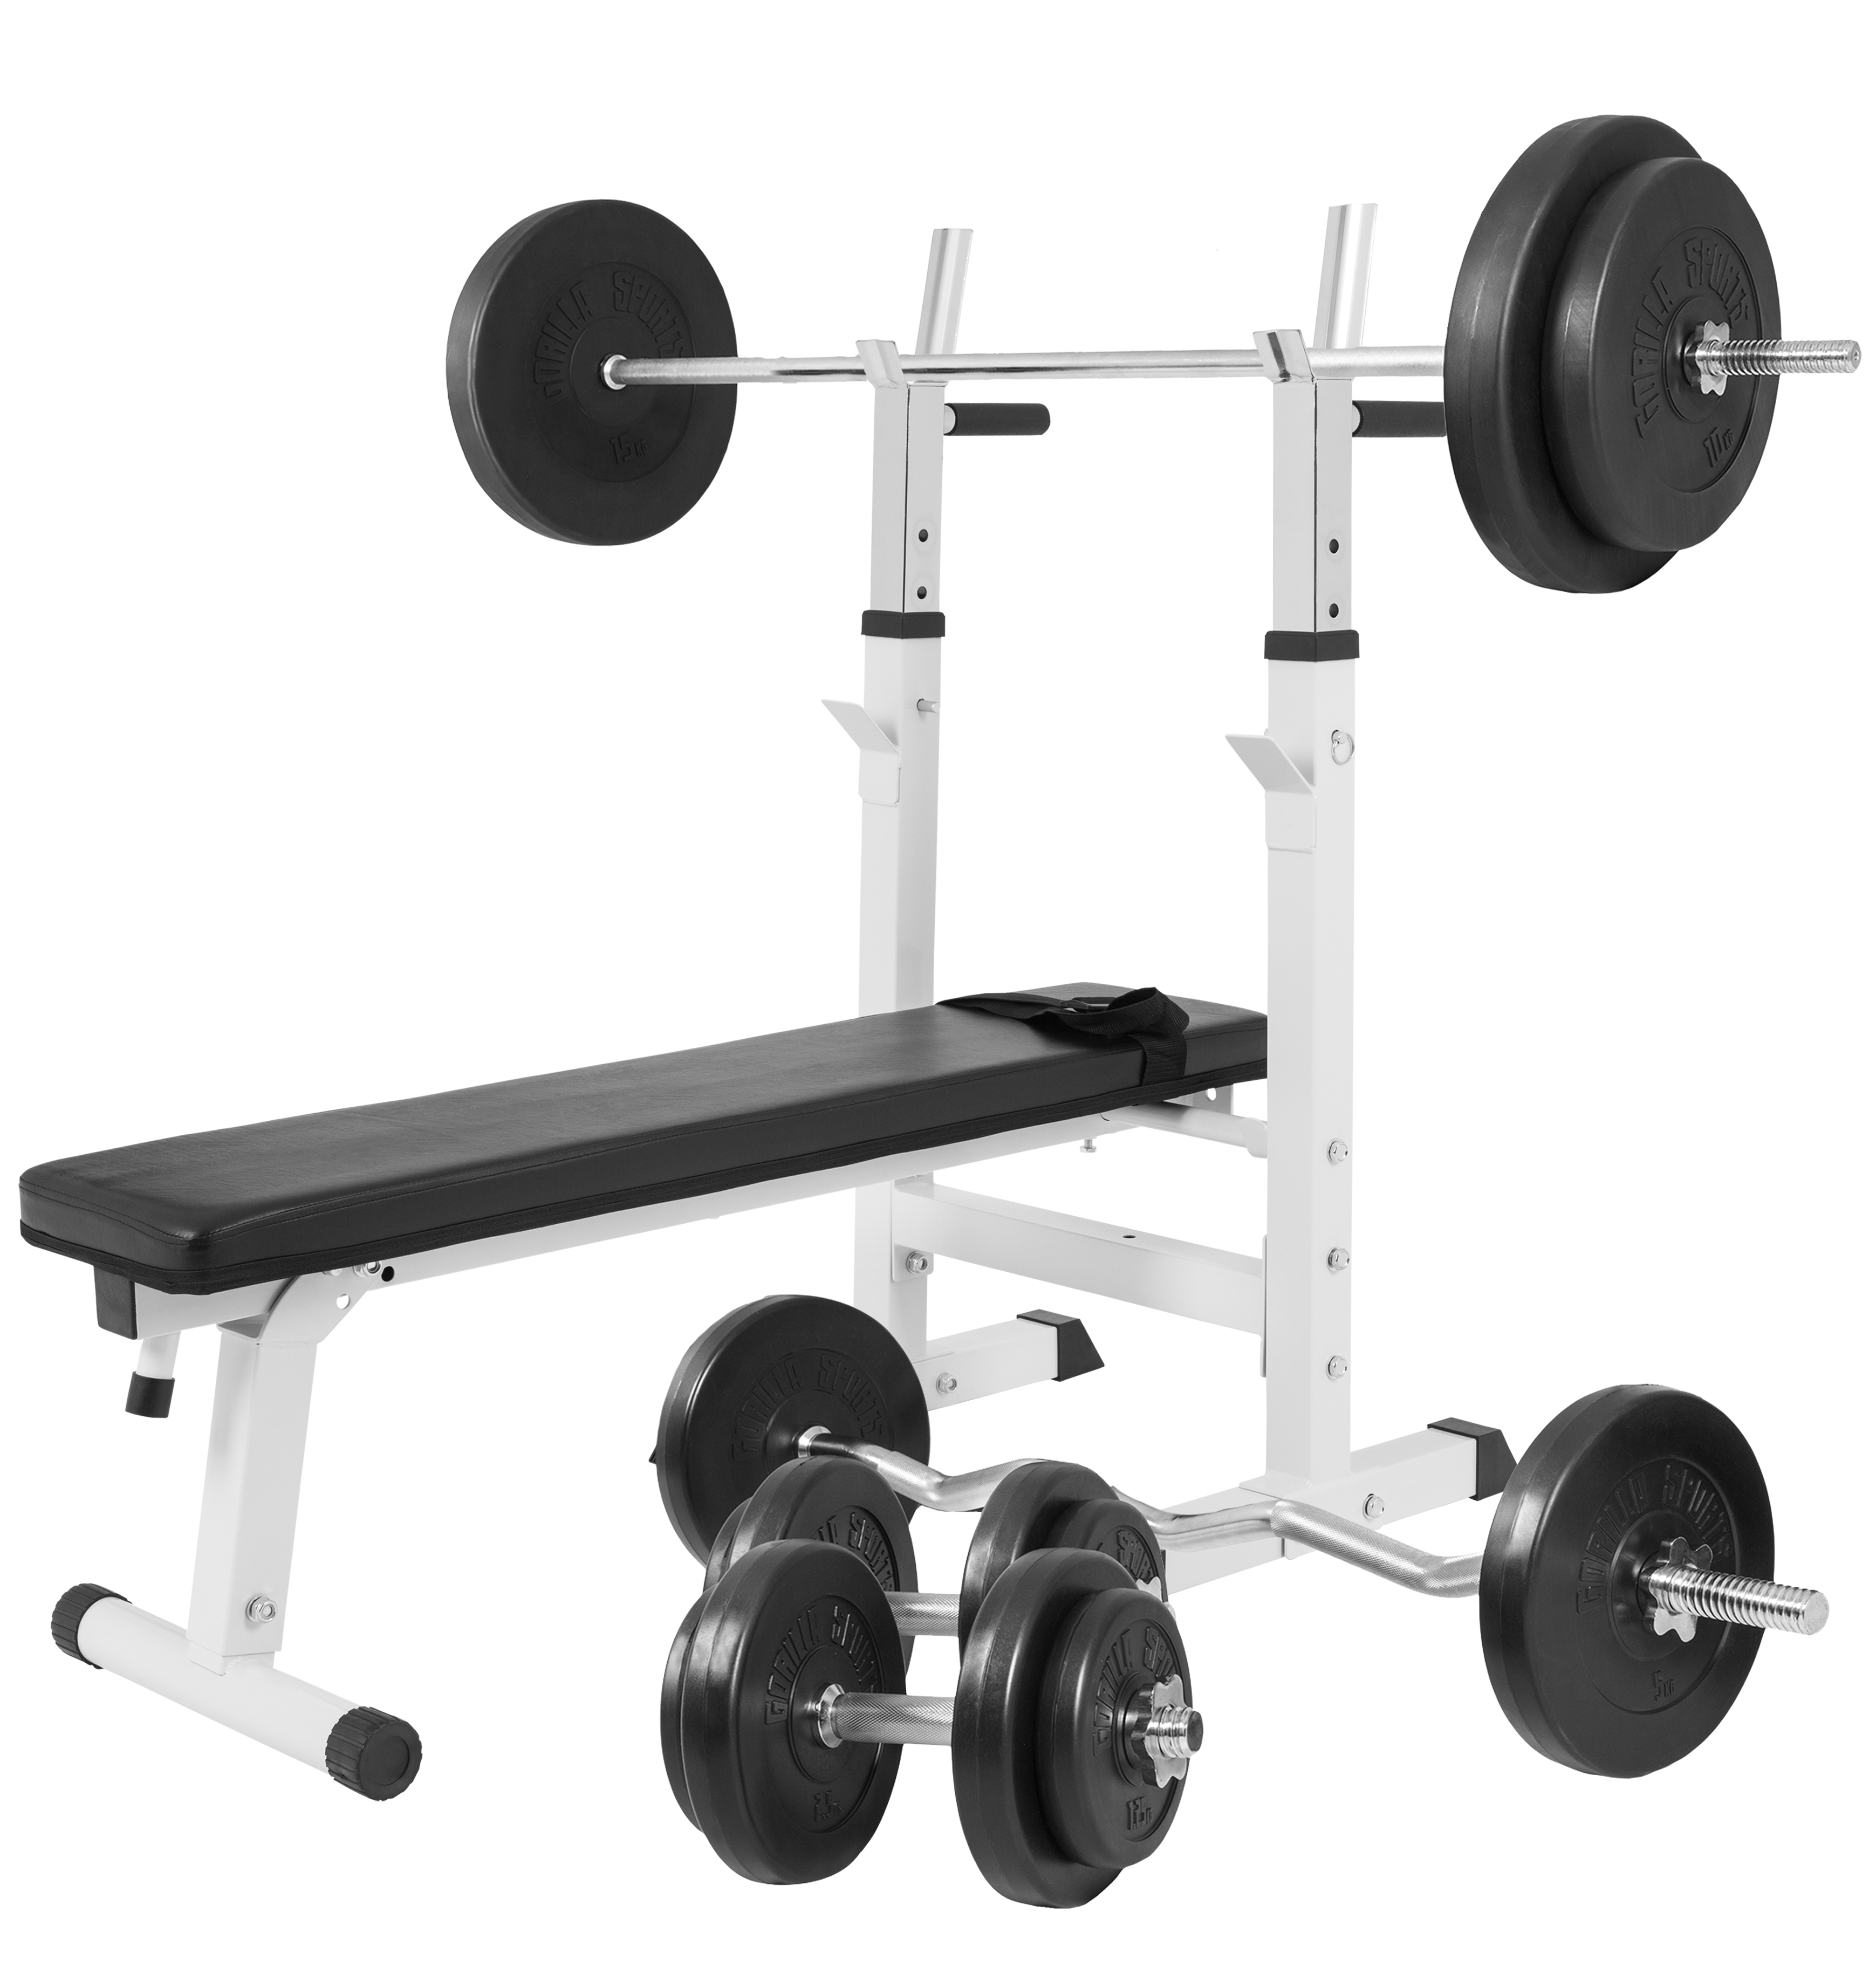 Gorilla Sports Hantelbank weiß mit Langhantelset 100 kg 100299-00022-0048